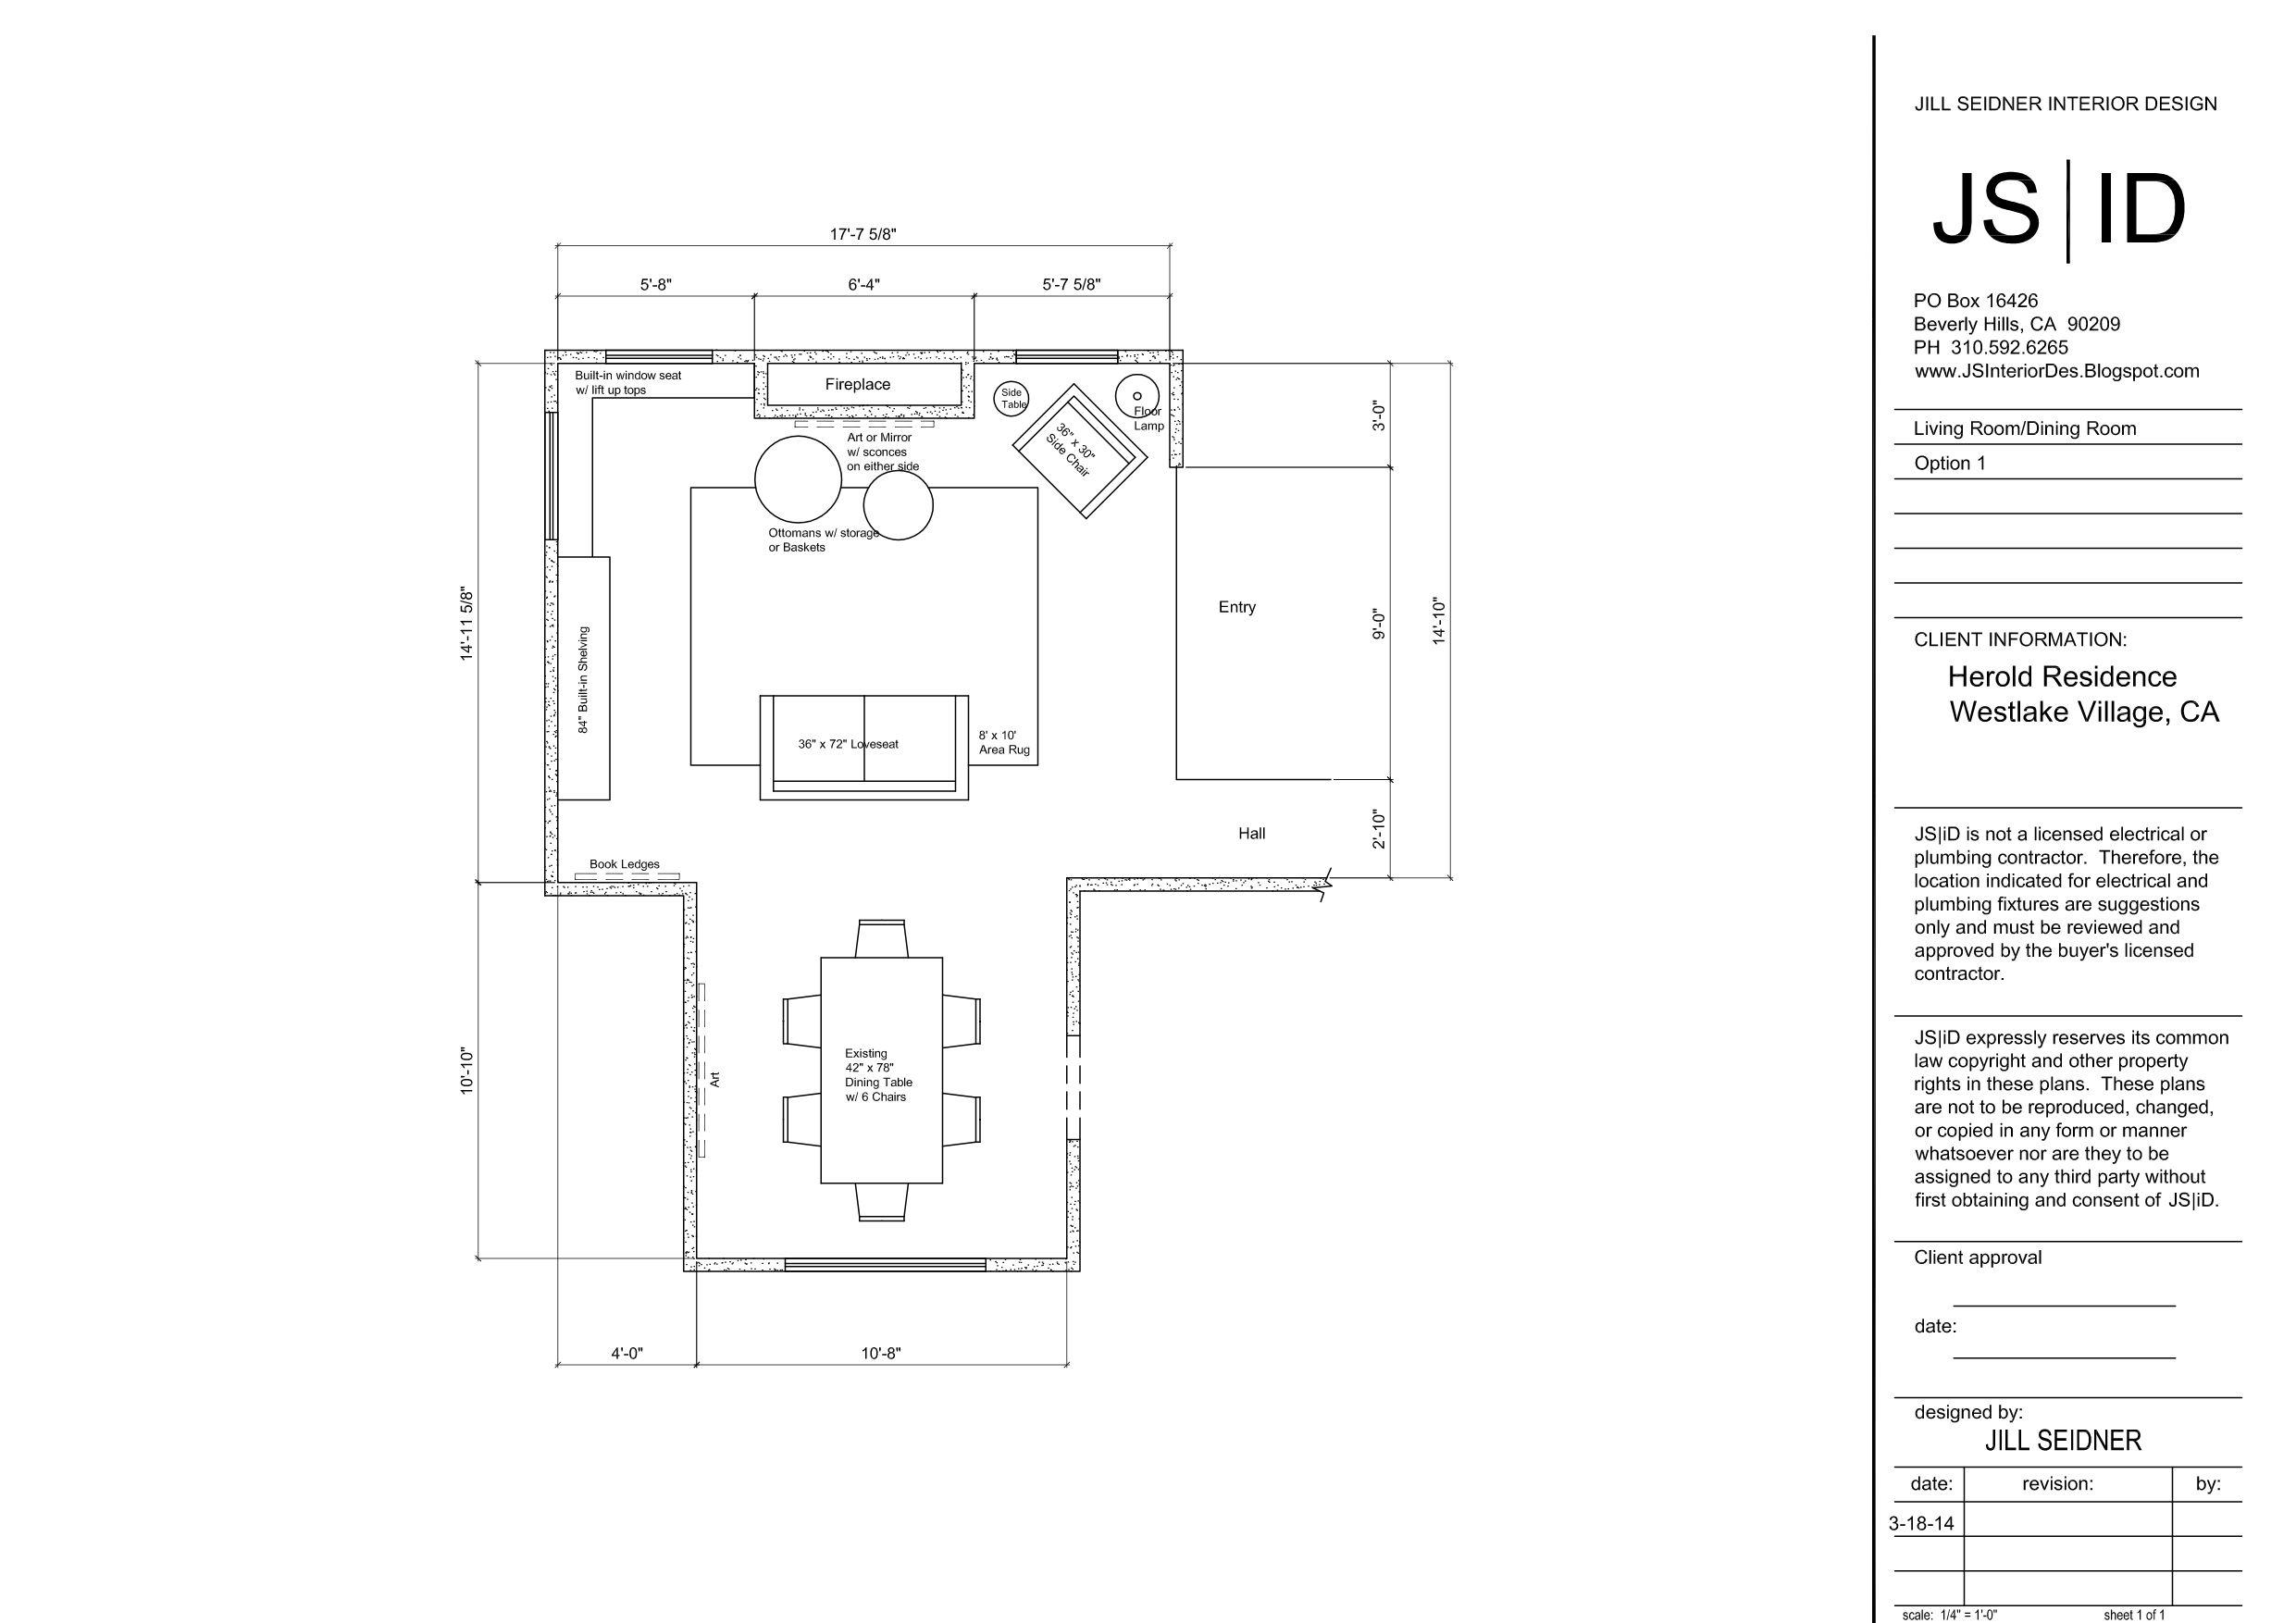 Westlake Village Ca Residence Living Dining Room Furniture Floor Plan Layout Option 1 Www Jsinteriordes B Floor Plan Layout Interior Design Drawings Design